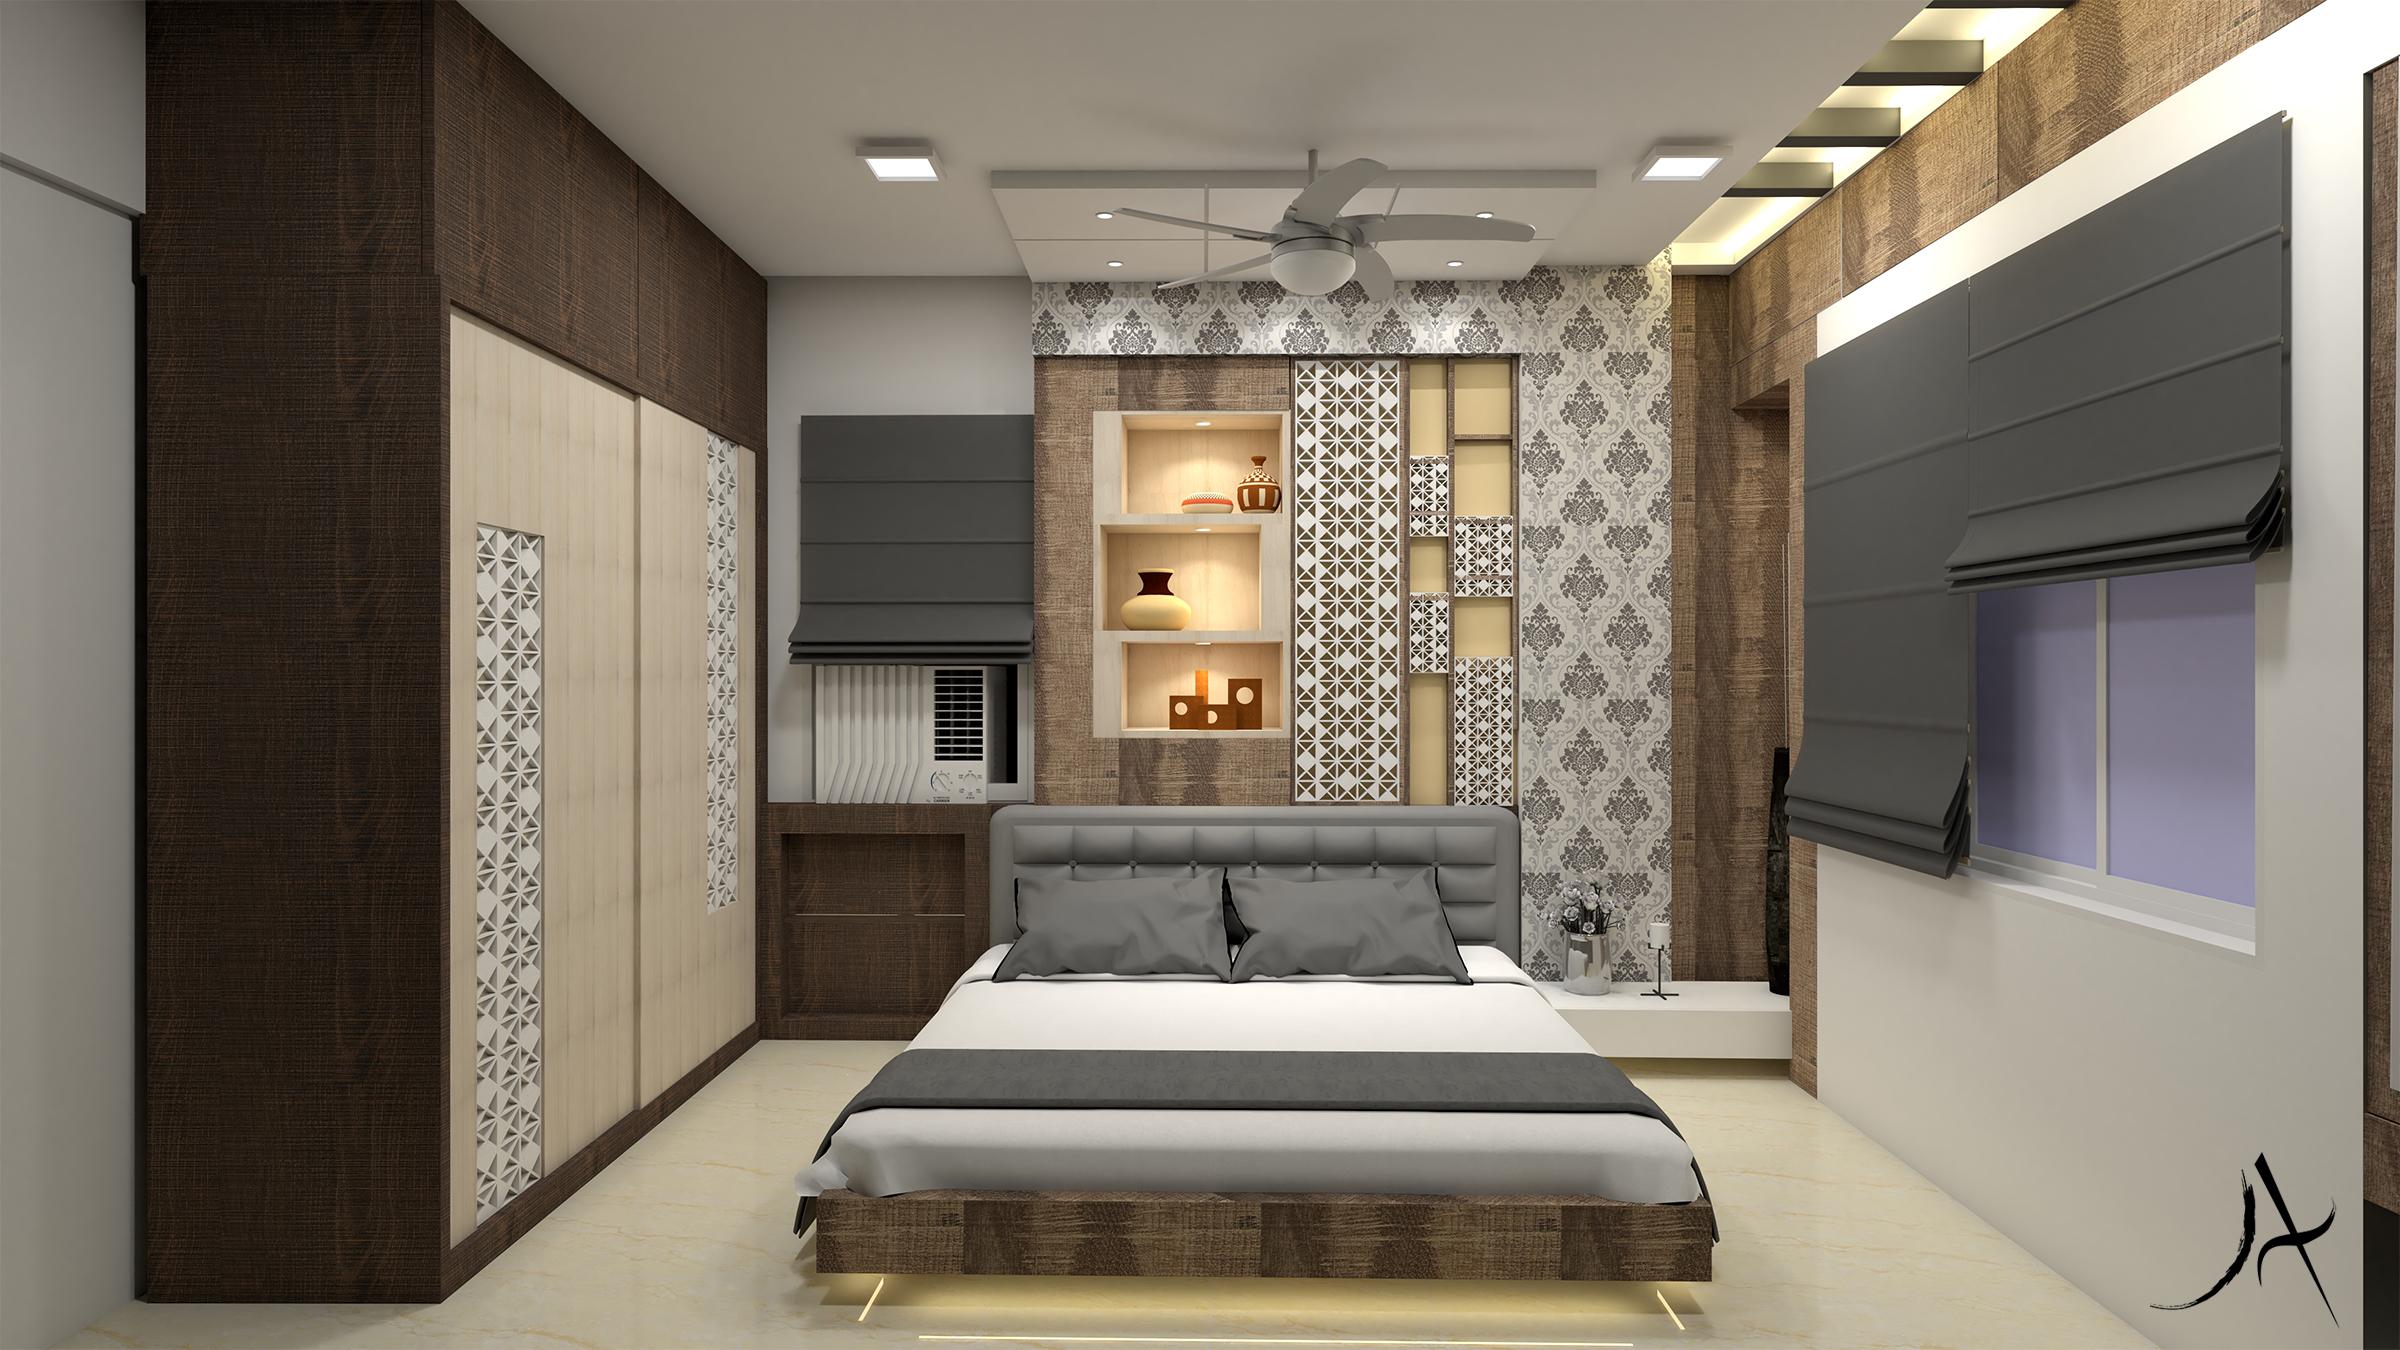 16 Master Bedroom Option 2 View 1